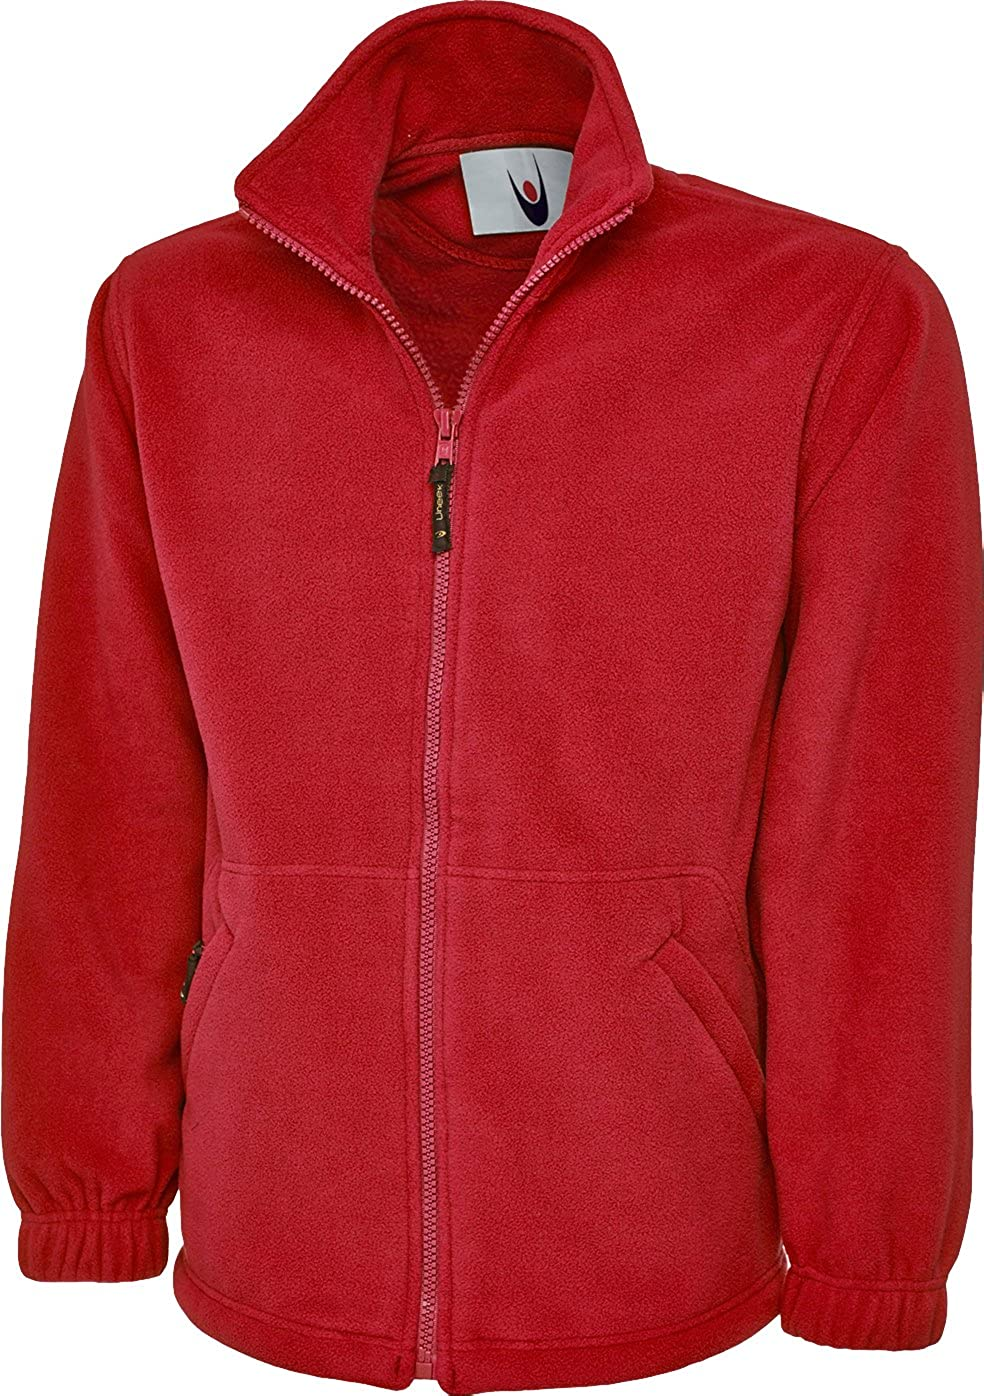 Uneek UC604 Mens Adult Classic Full Zip Micro Fleece Coat Jacket Size XS-6XL Shoppersbay